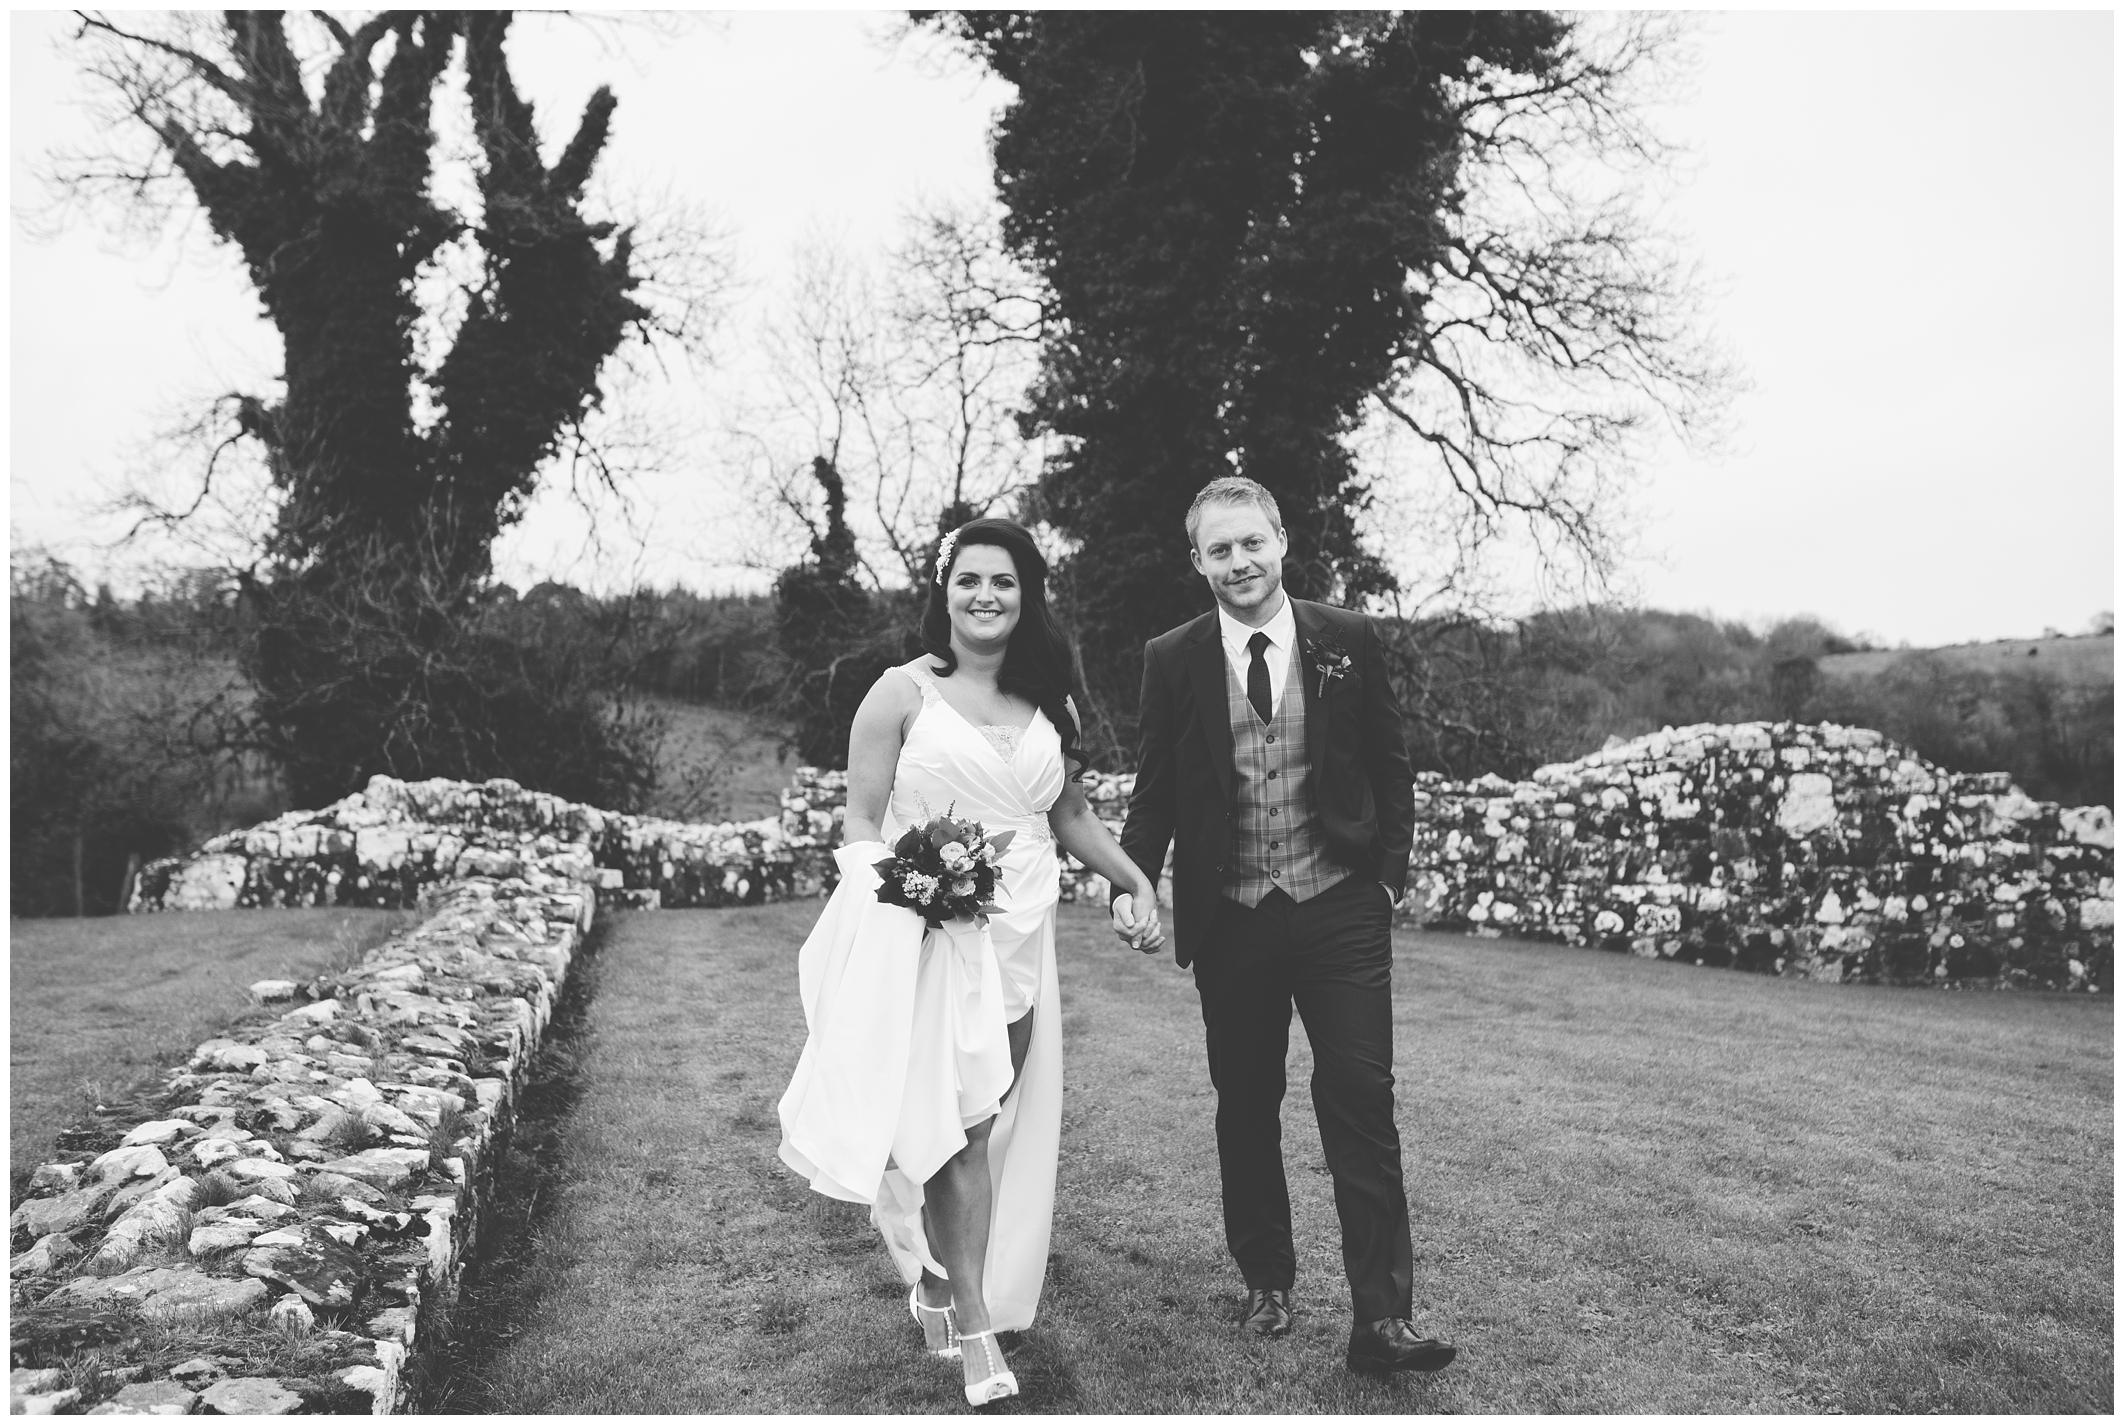 tracey_conor__wedding_jude_browne_photography_0058.jpg